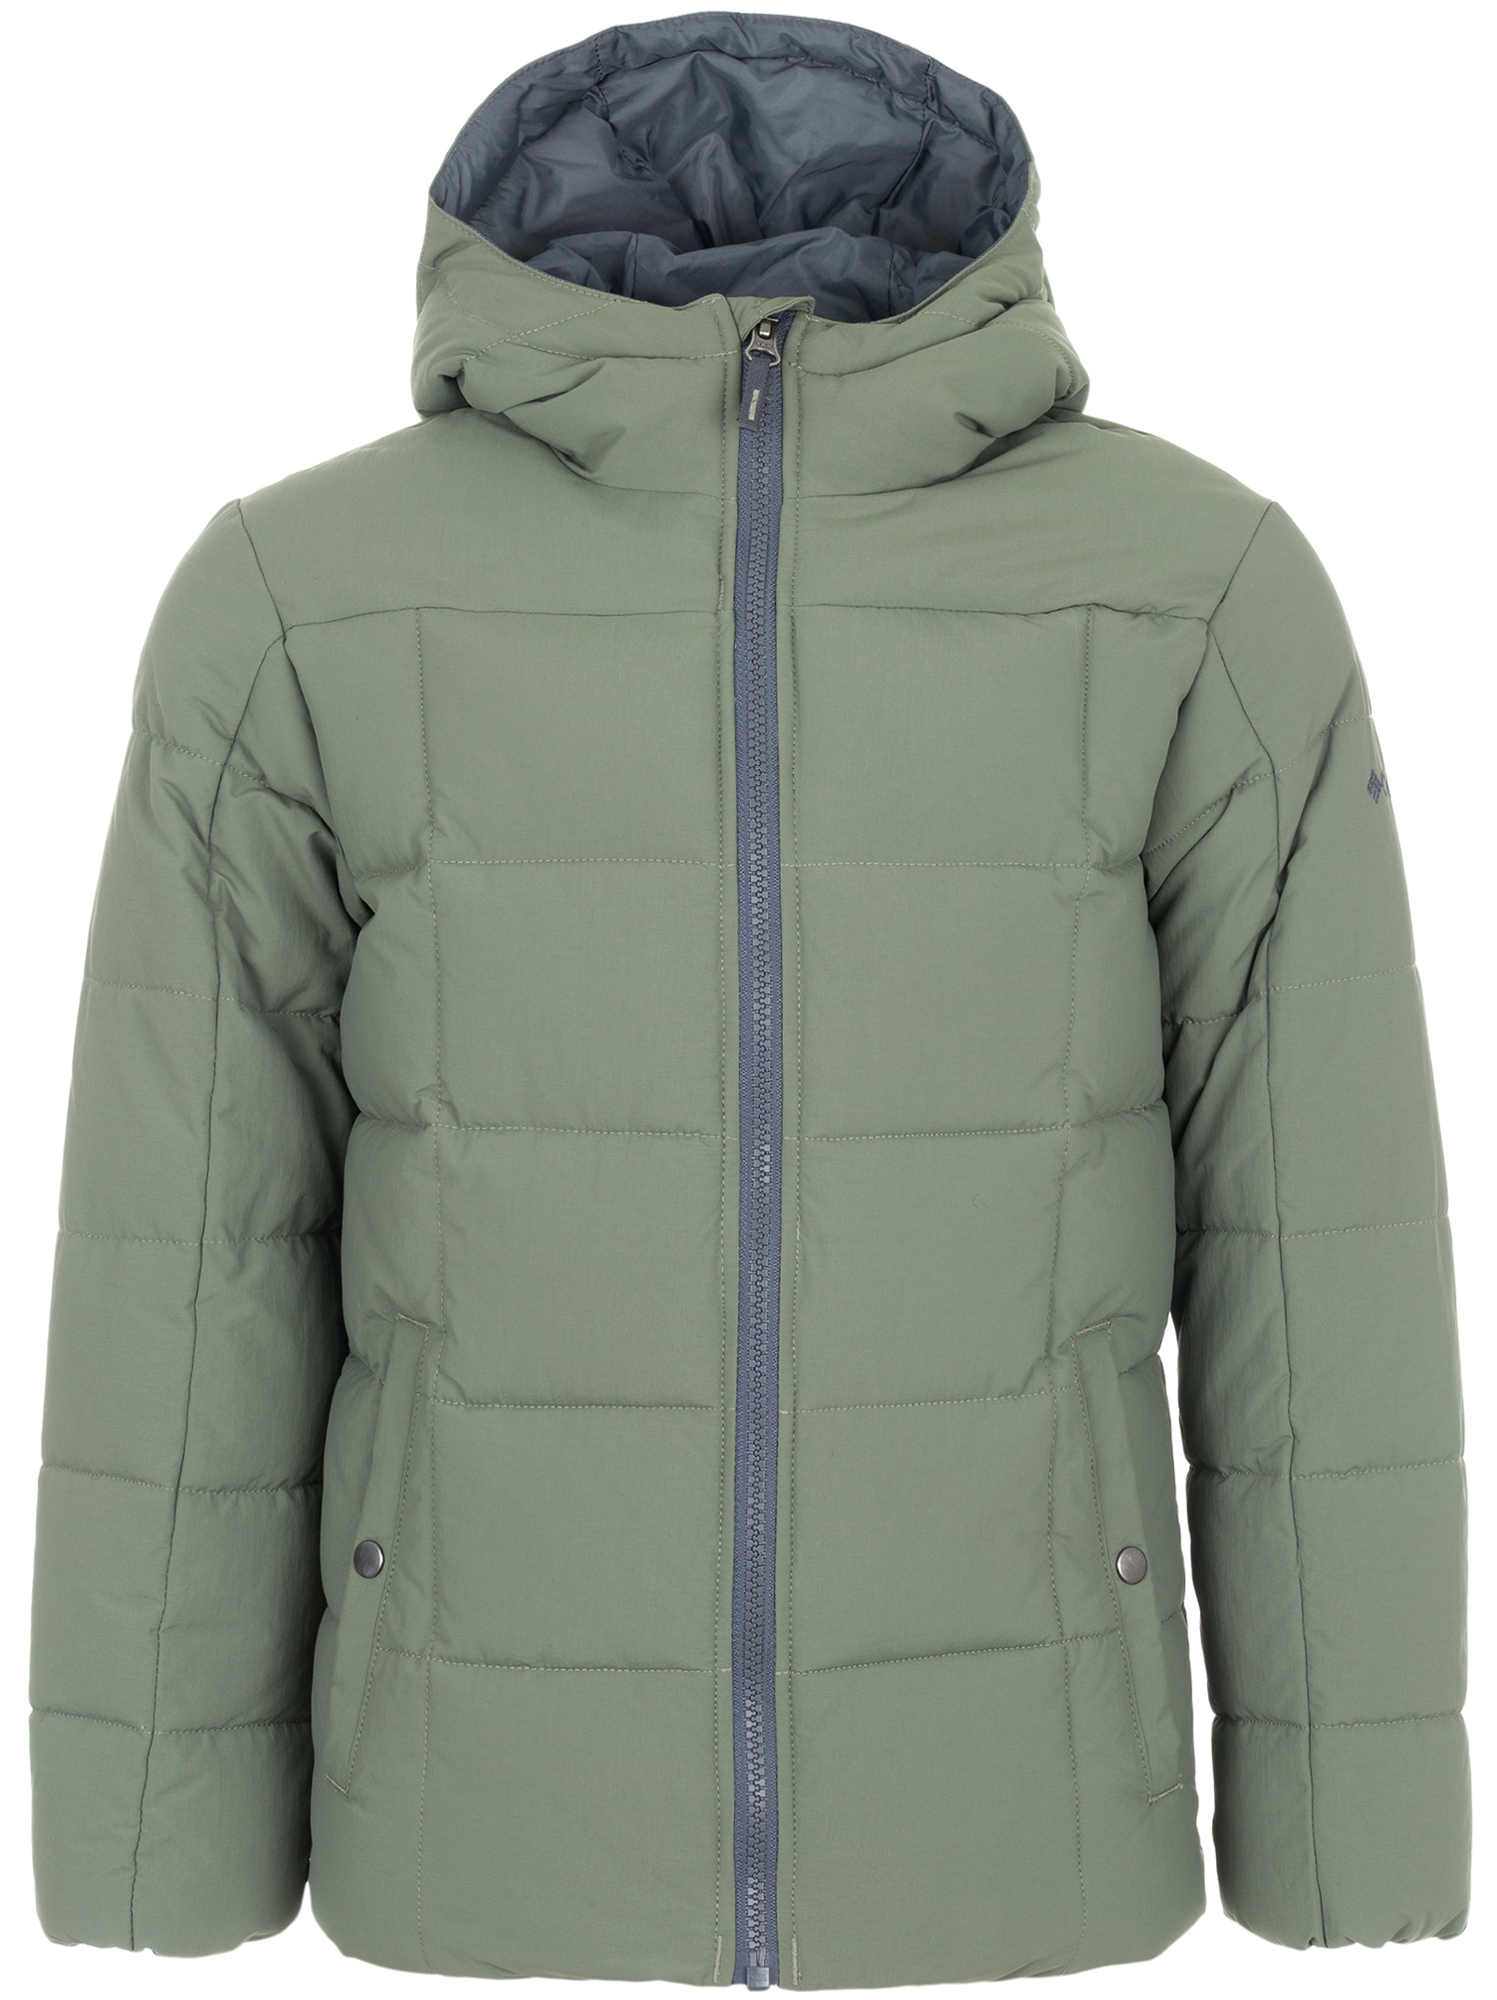 Columbia Куртка утепленная для мальчиков Columbia Snowball columbia куртка утепленная для девочек columbia horizon ride